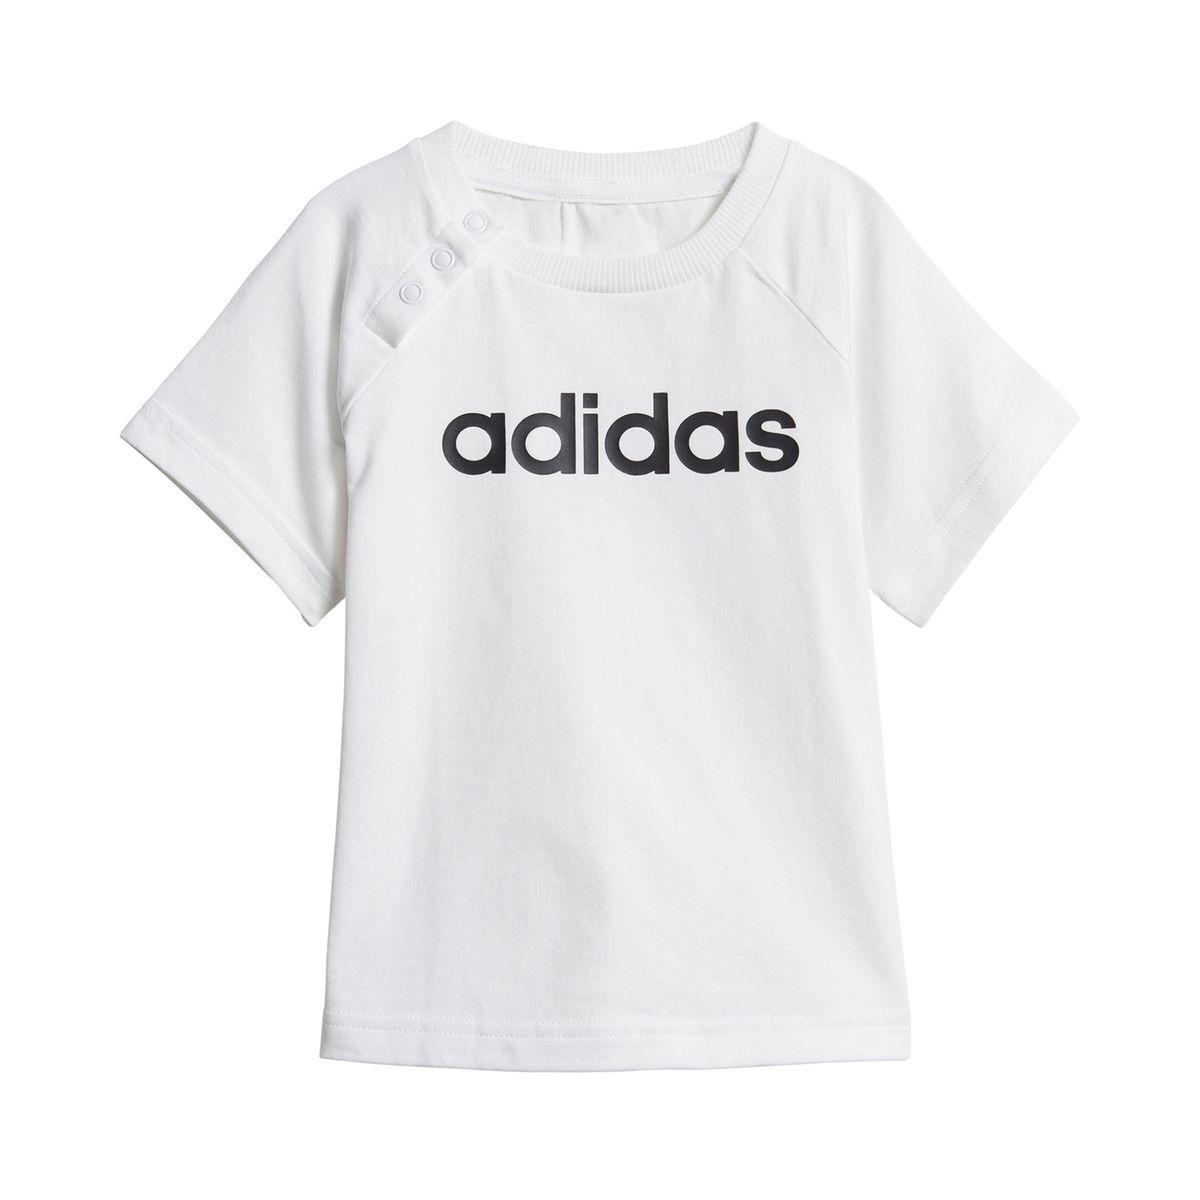 tee shirt adidas garcon 4 ans